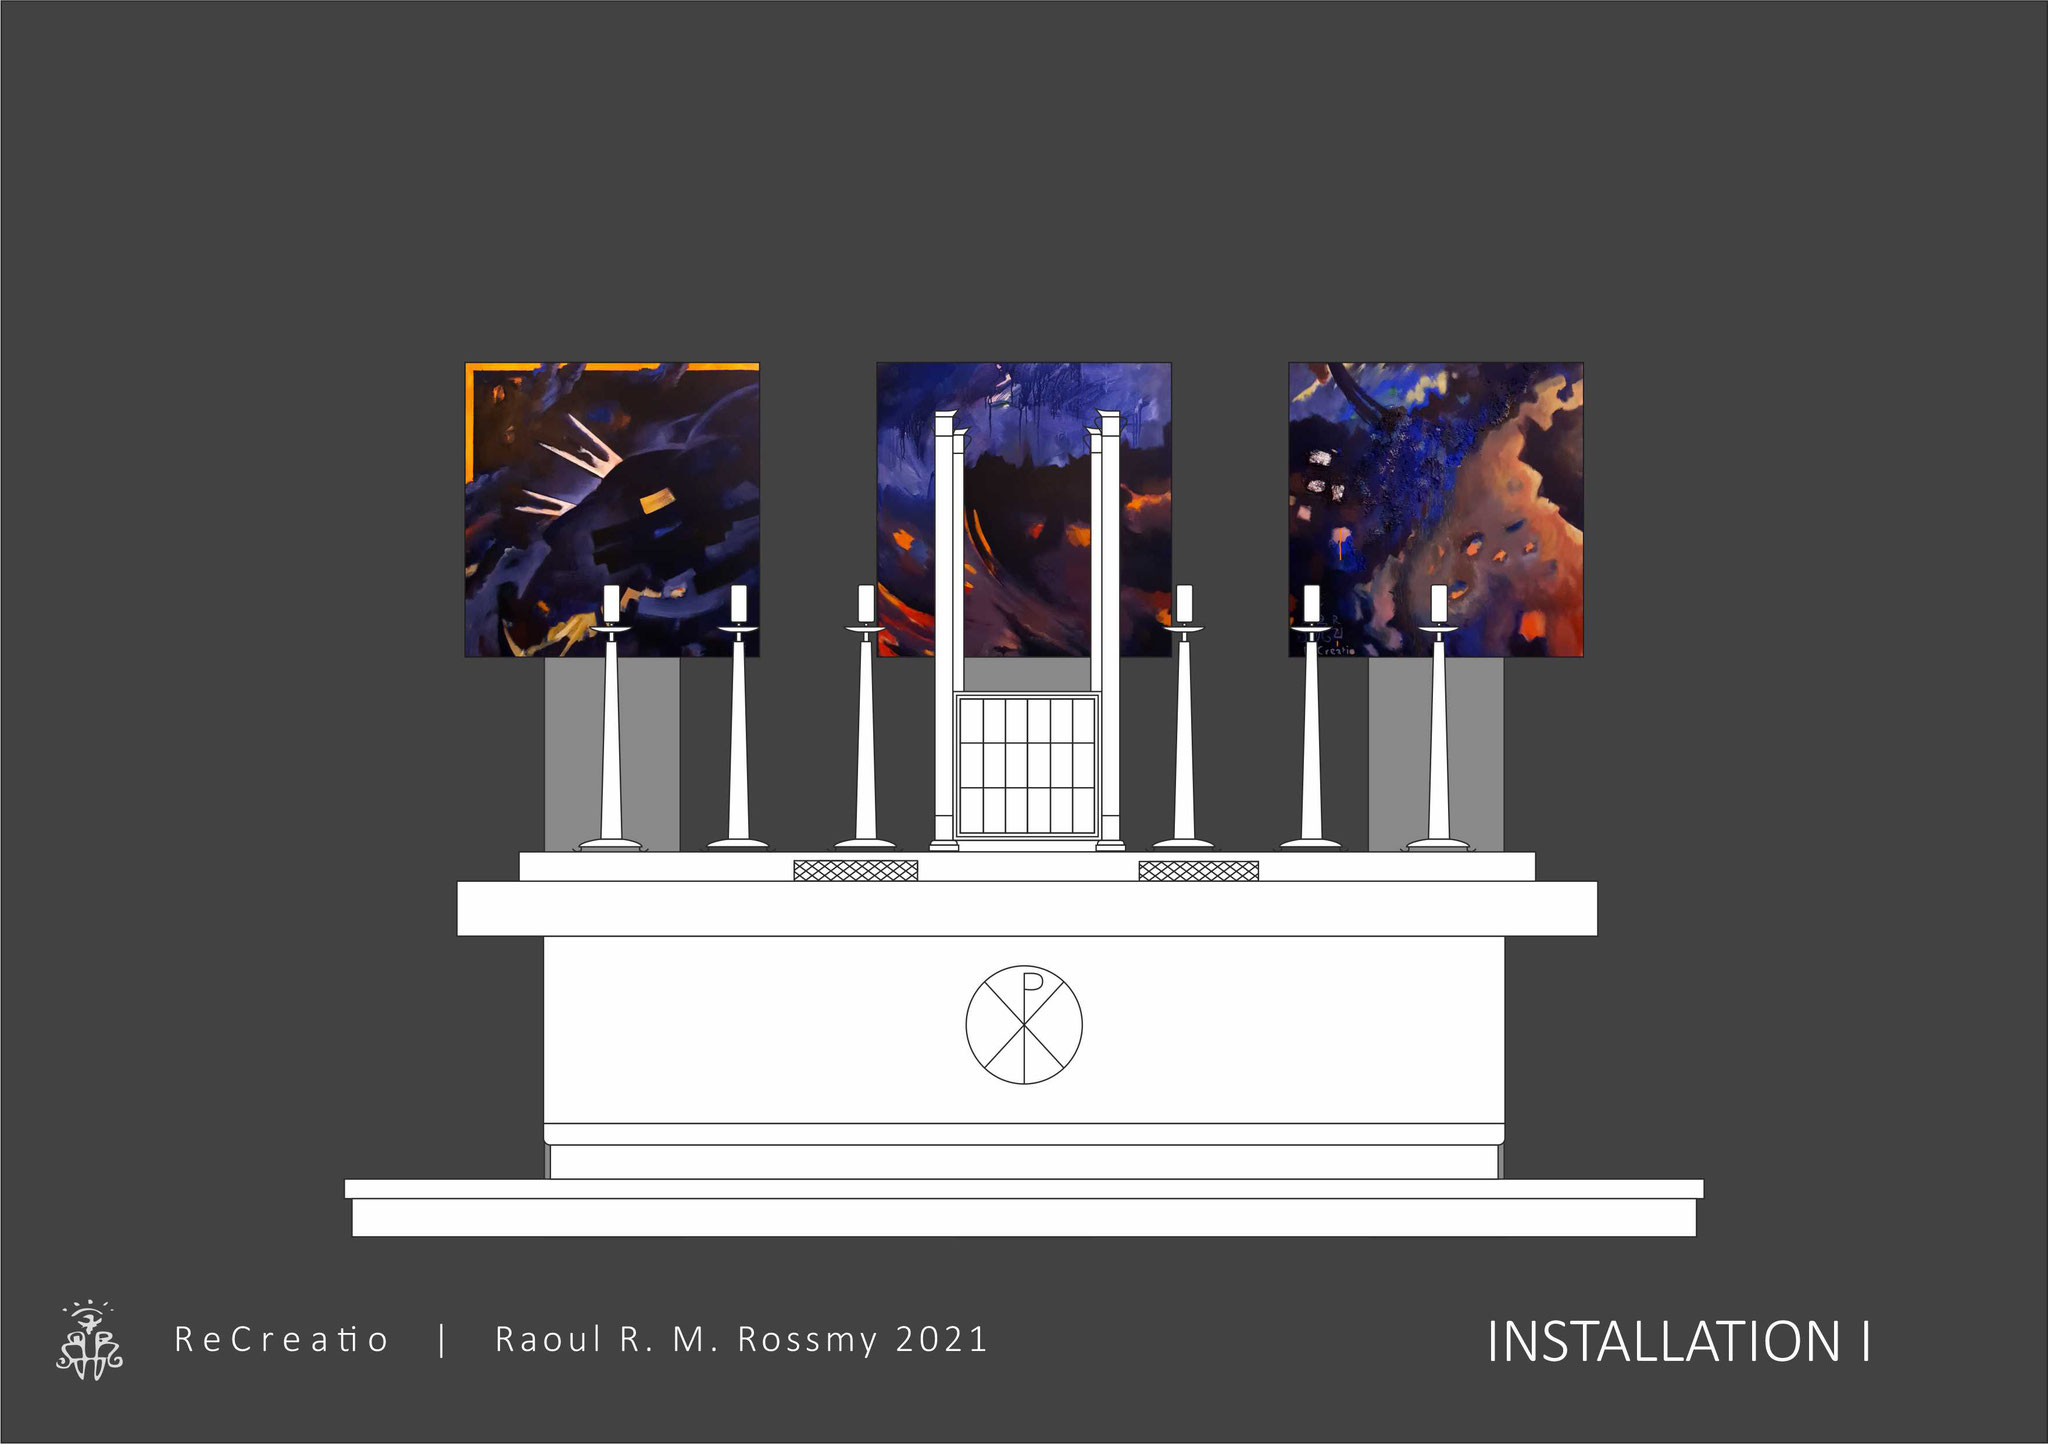 ReCreatio | Raoul R. M. Rossmy 2021 | Installation I